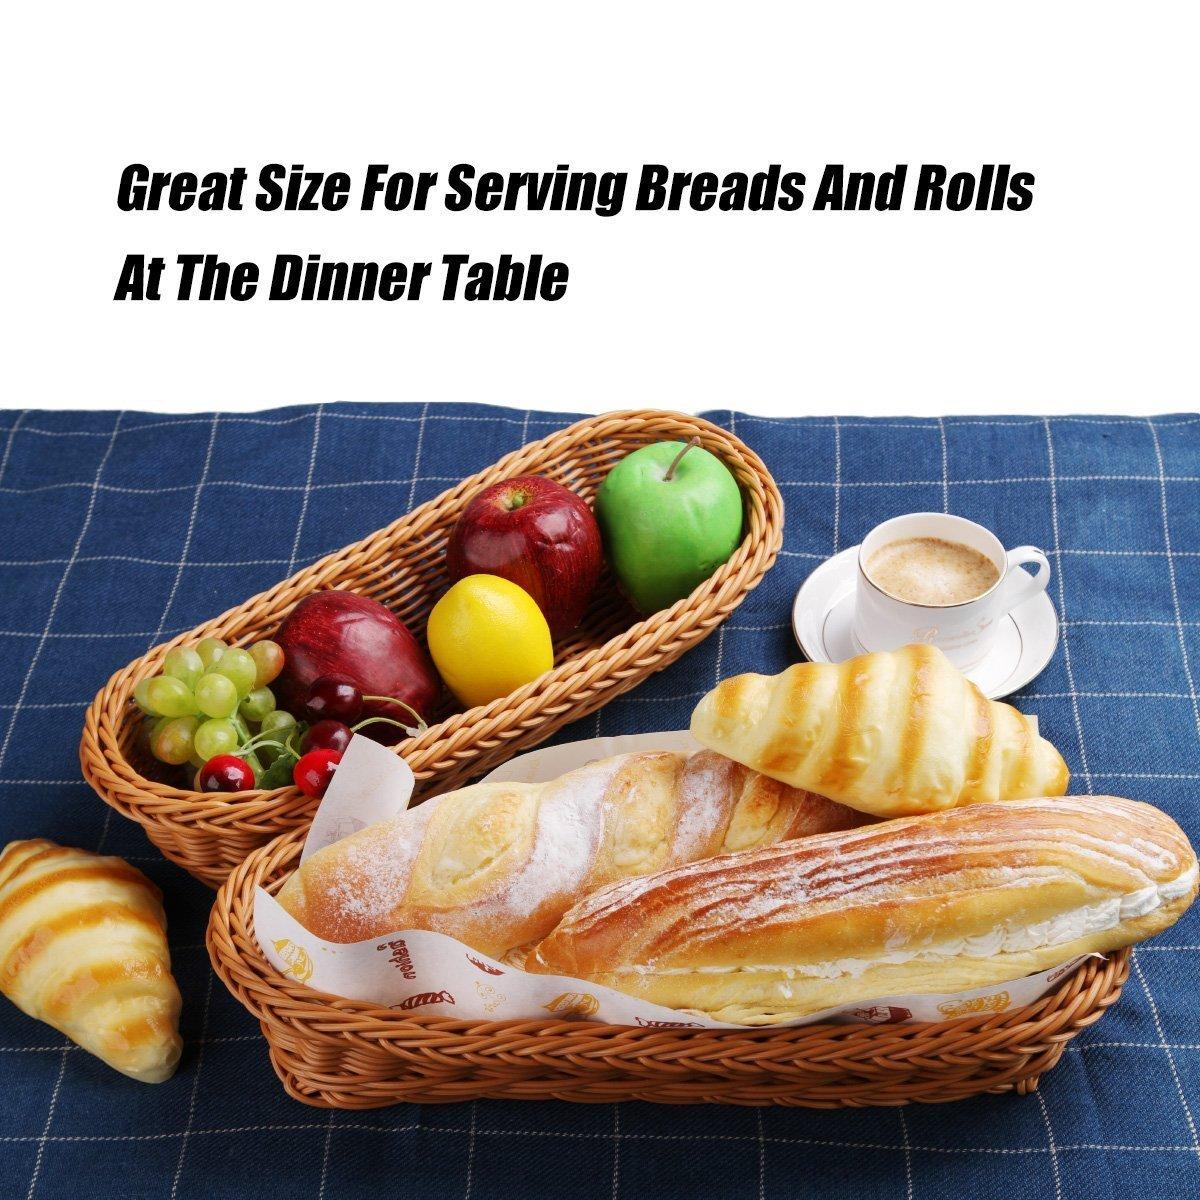 2 Set 14.5'' Poly-Wicker Bread Basket, Long Woven Tabletop Food Serving Basket, Honey Brown - Set of 2 by Make it fun (Image #6)